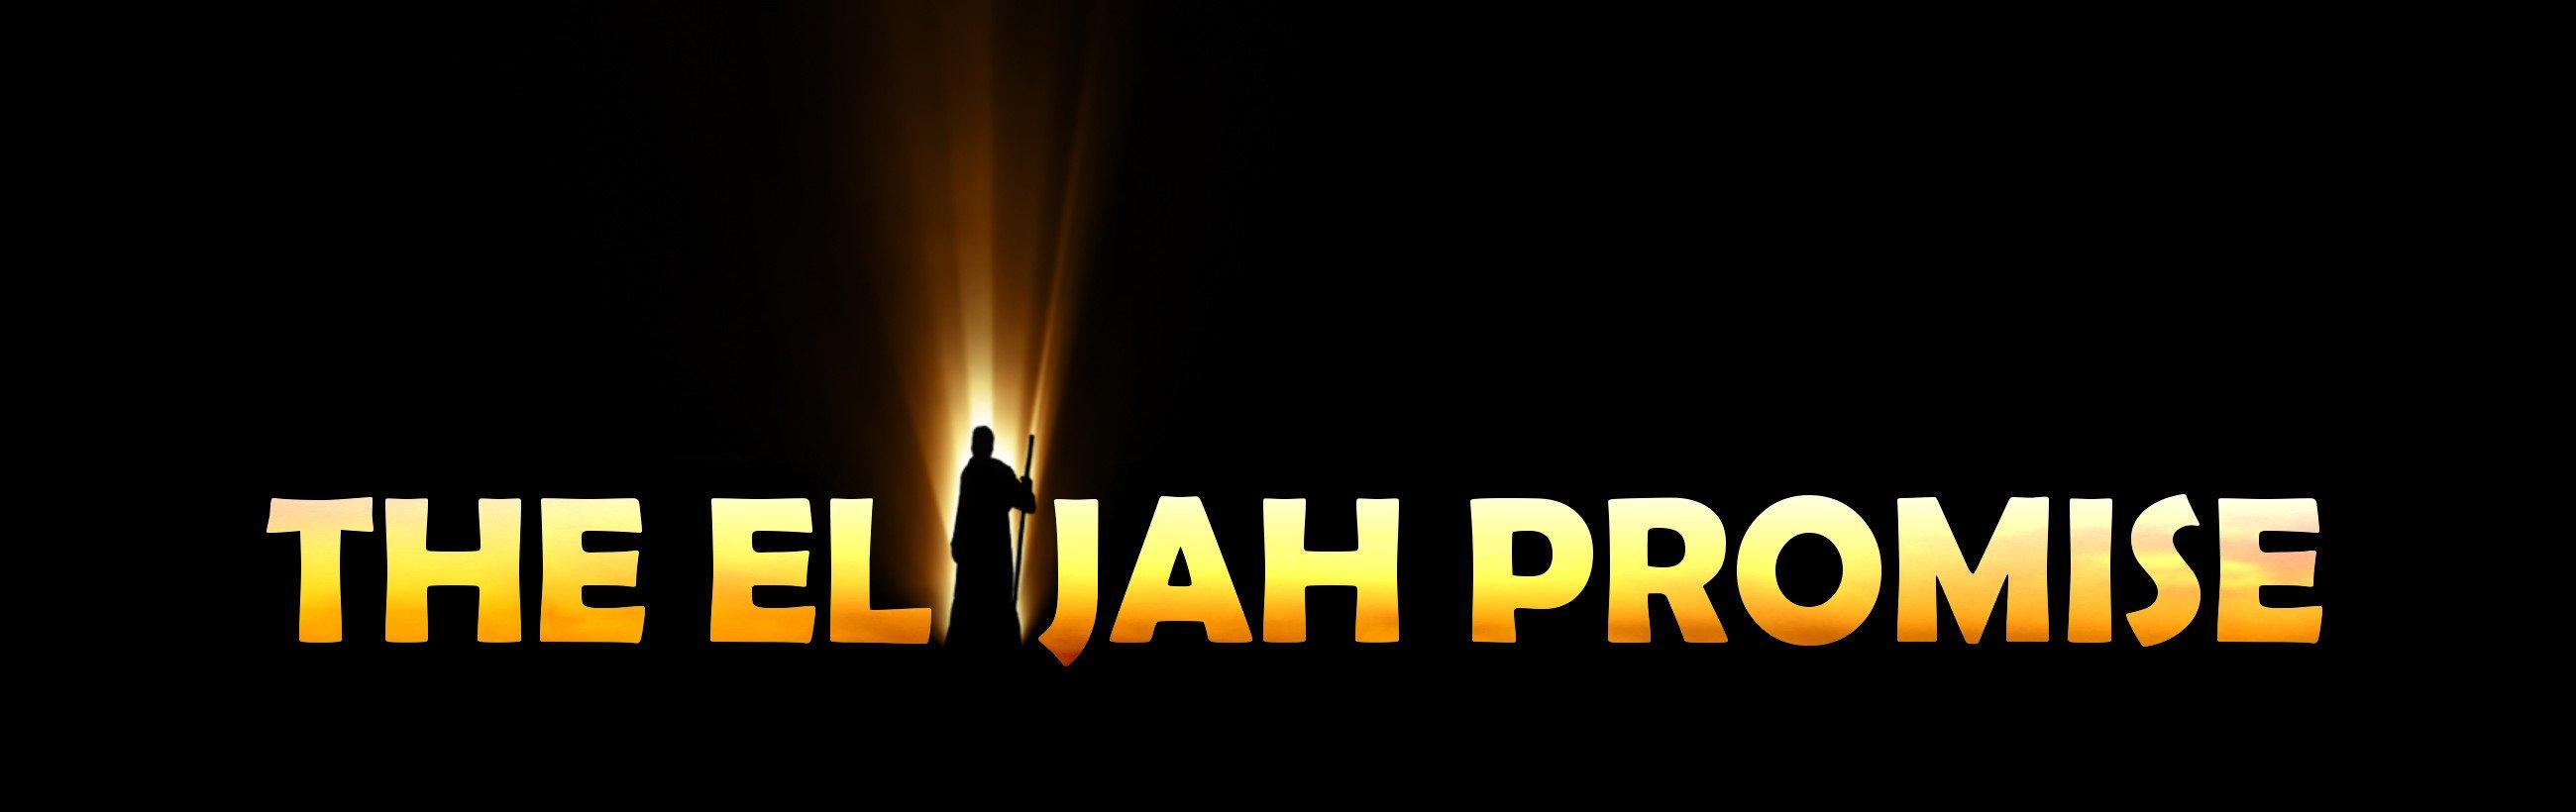 The Elijah Promise